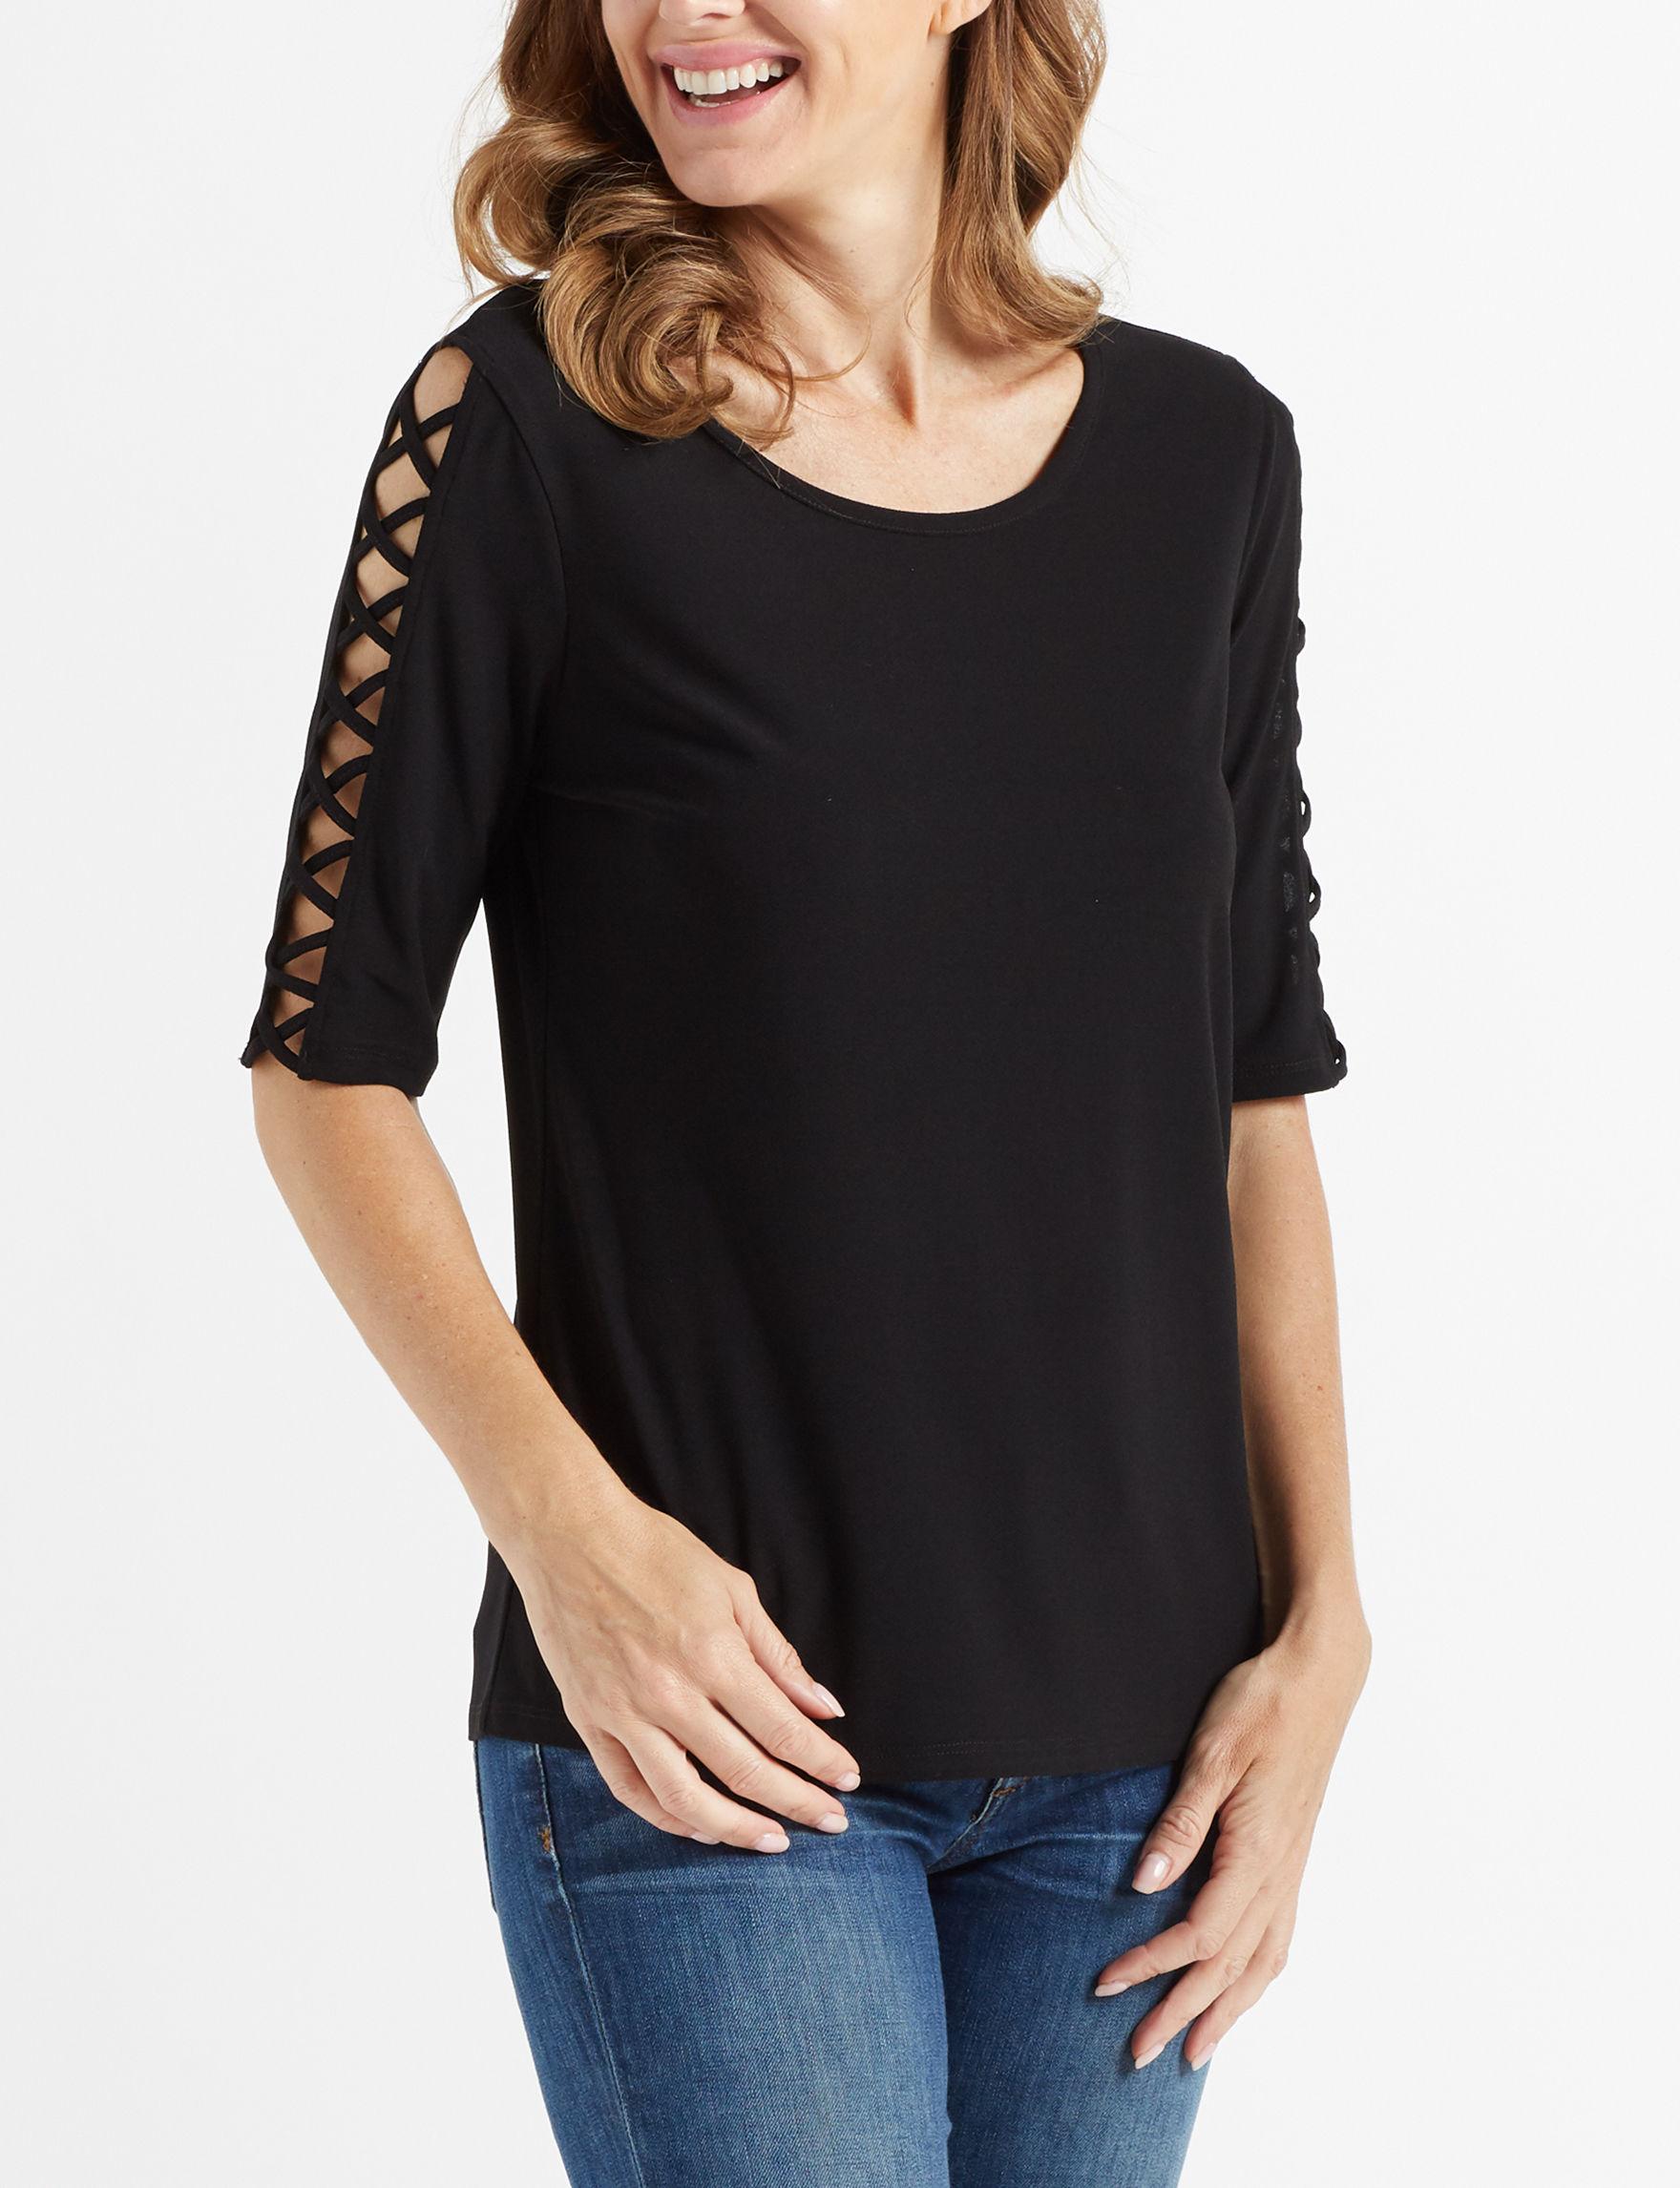 89th & Madison Black Shirts & Blouses